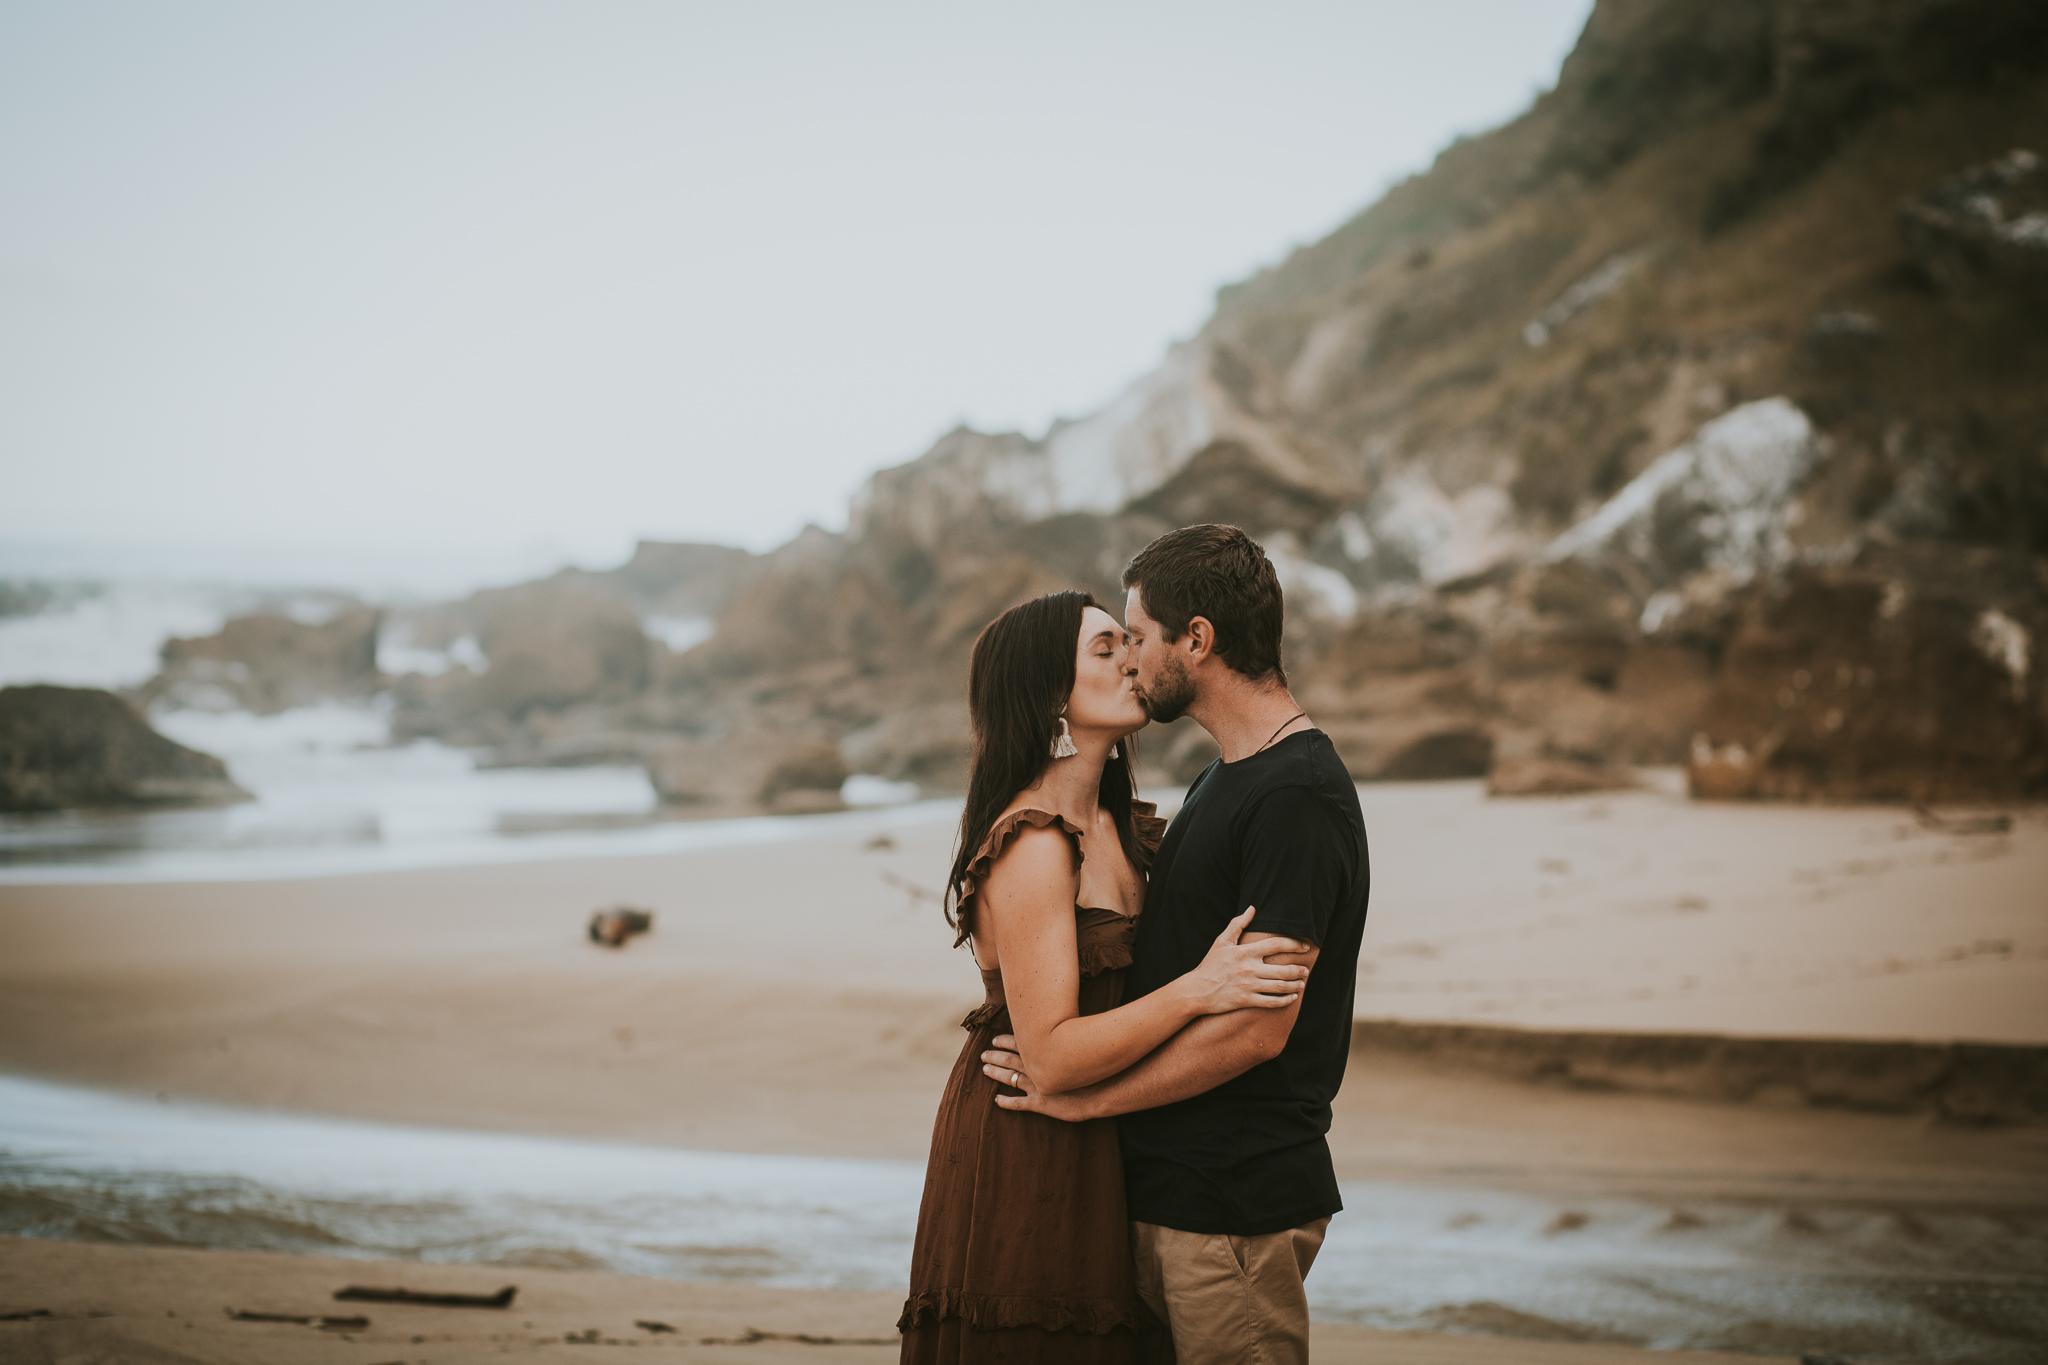 Nz Hawkes Bay Napier Wedding photographer waipatiki beach-52.jpg